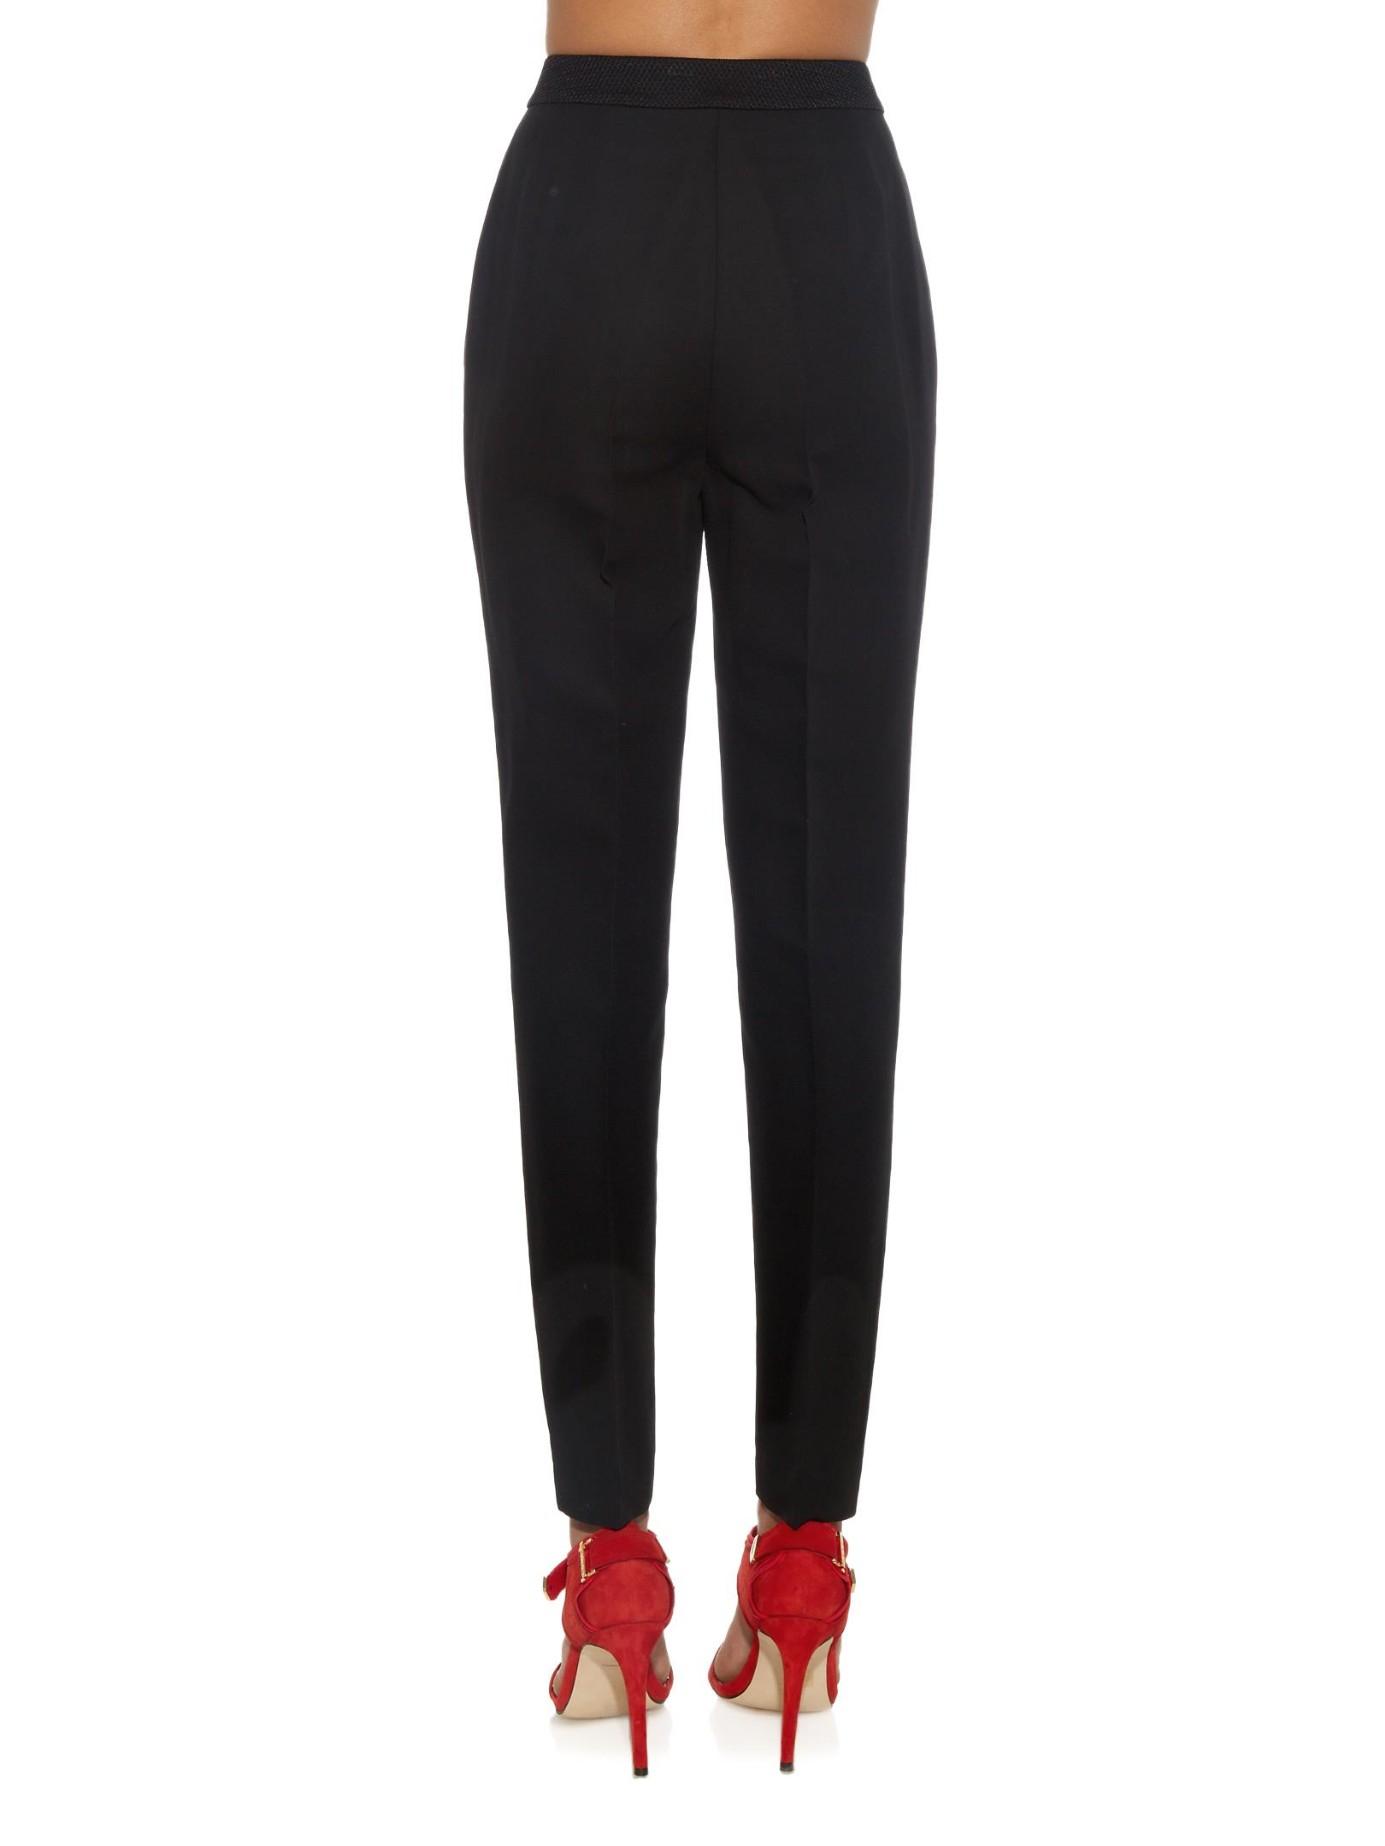 size 40 fine quality pretty cheap Alexander Wang Black High-Waist Leather-Trim Trousers